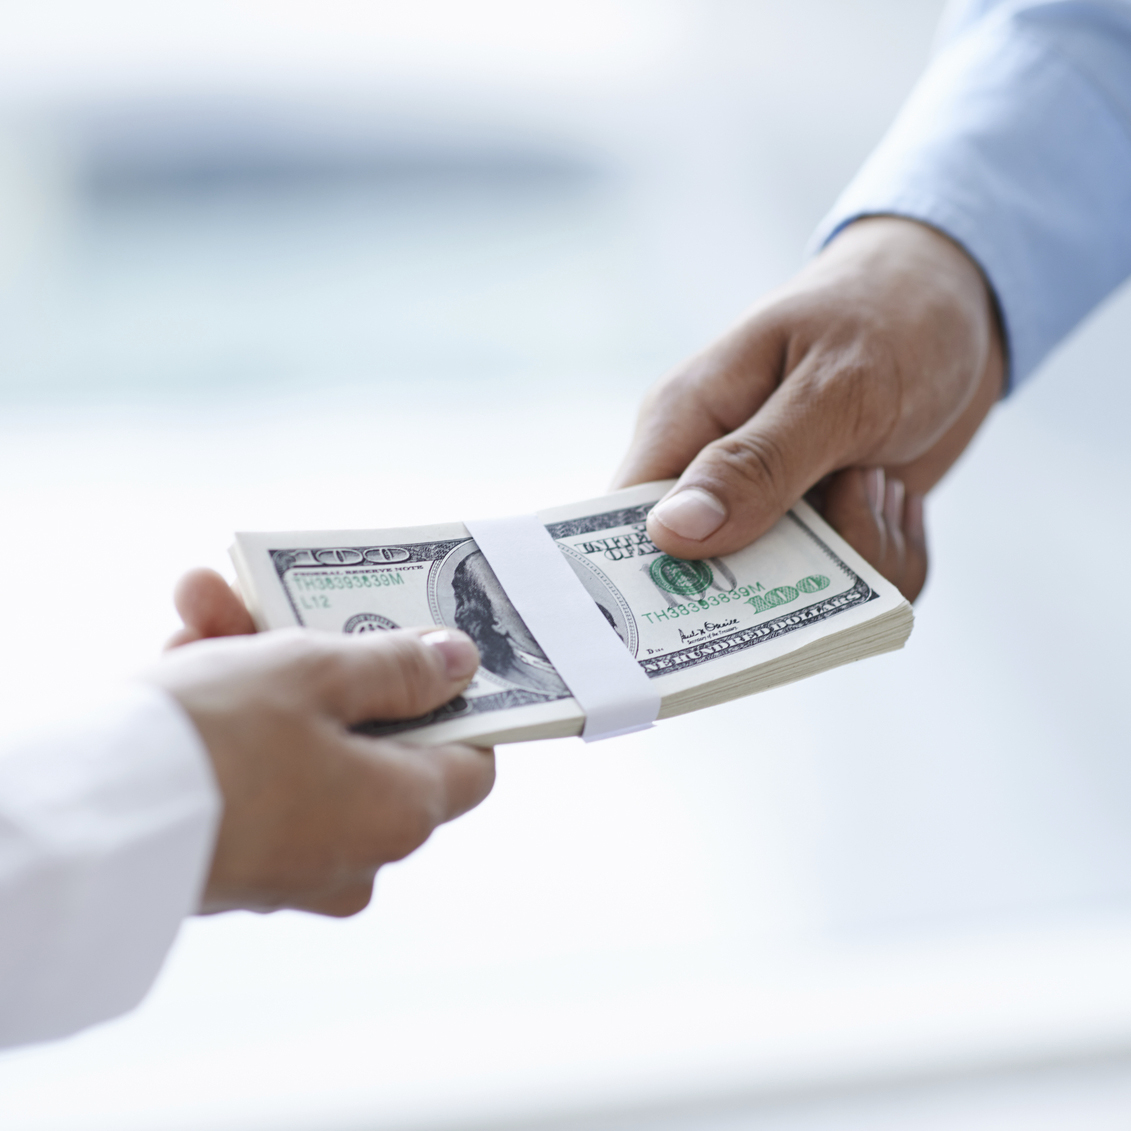 money_hands_icon.jpg